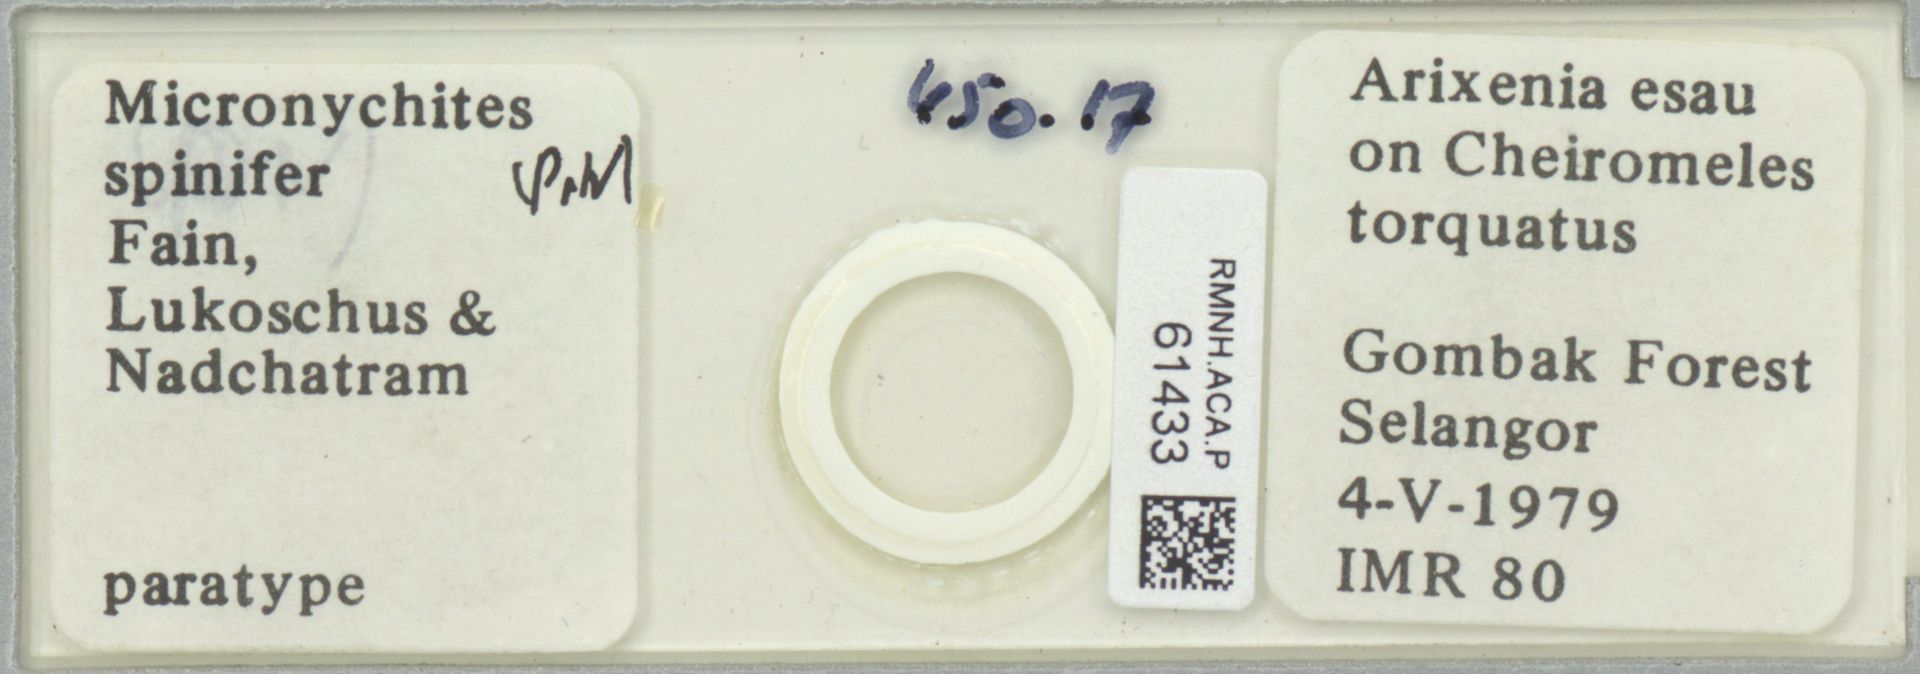 RMNH.ACA.P.61433 | Micronychites spinifer Fain, Lukoschus & Nadchatram